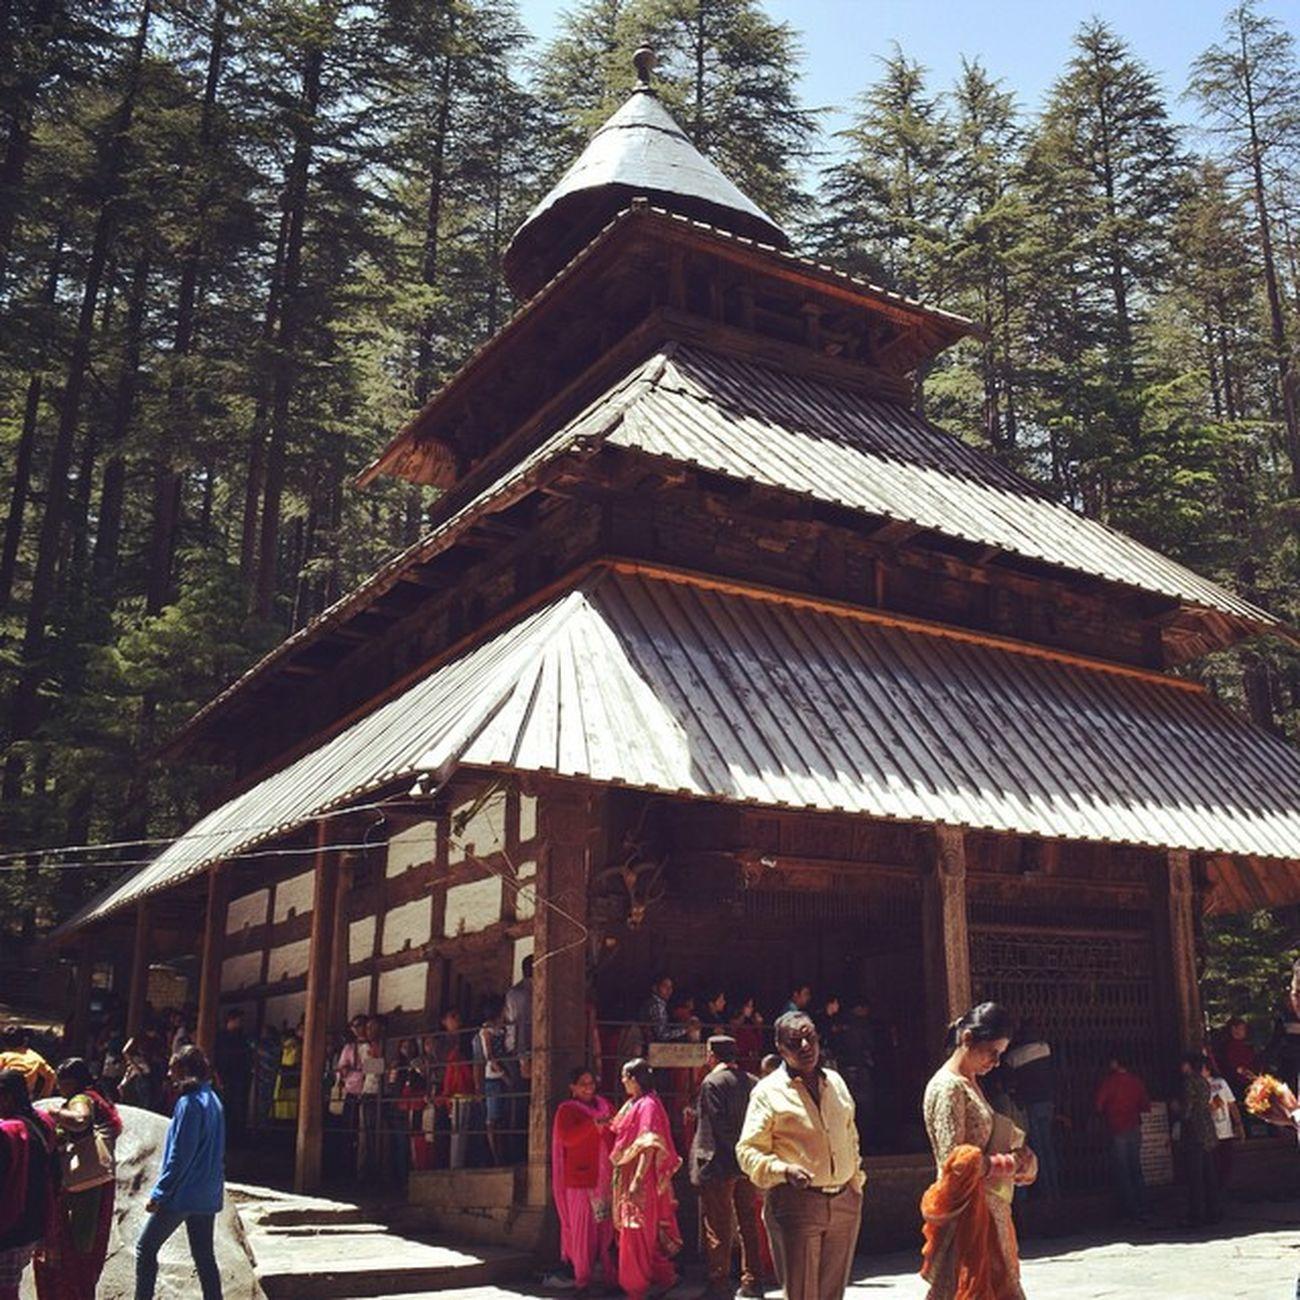 Hidimba_devi Temple Manali Himachal Himachal Pradesh Insta_himachal India Beas Wooden Forest Van_vihar Religious  Place Wonderful Cave_temple